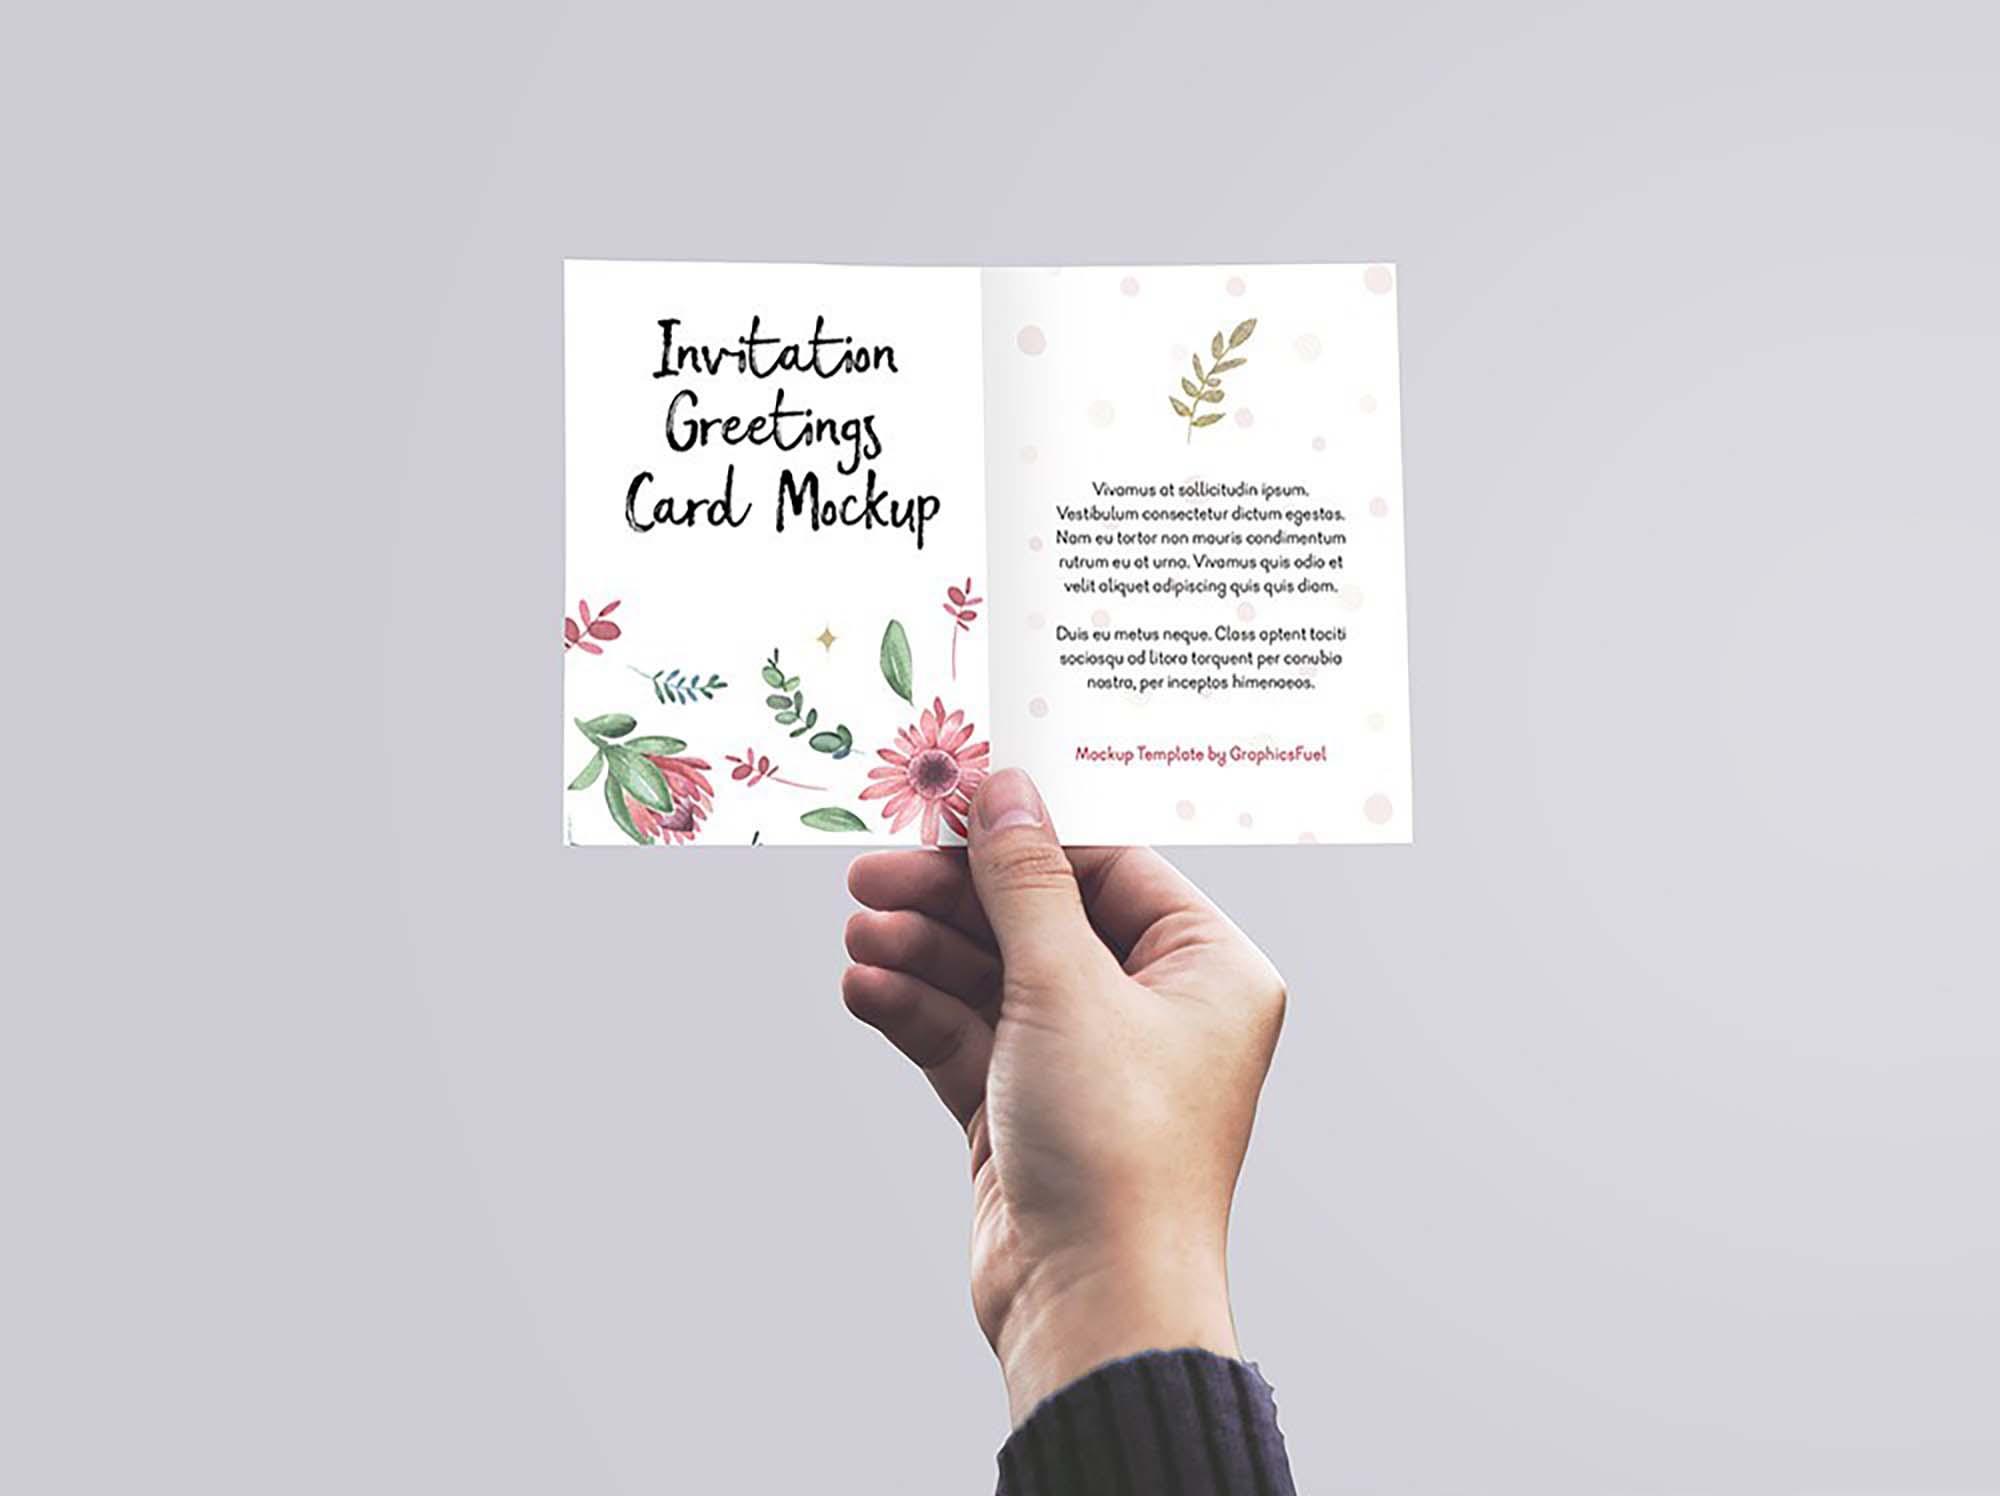 Invitation Greeting Card in Hand Mockup